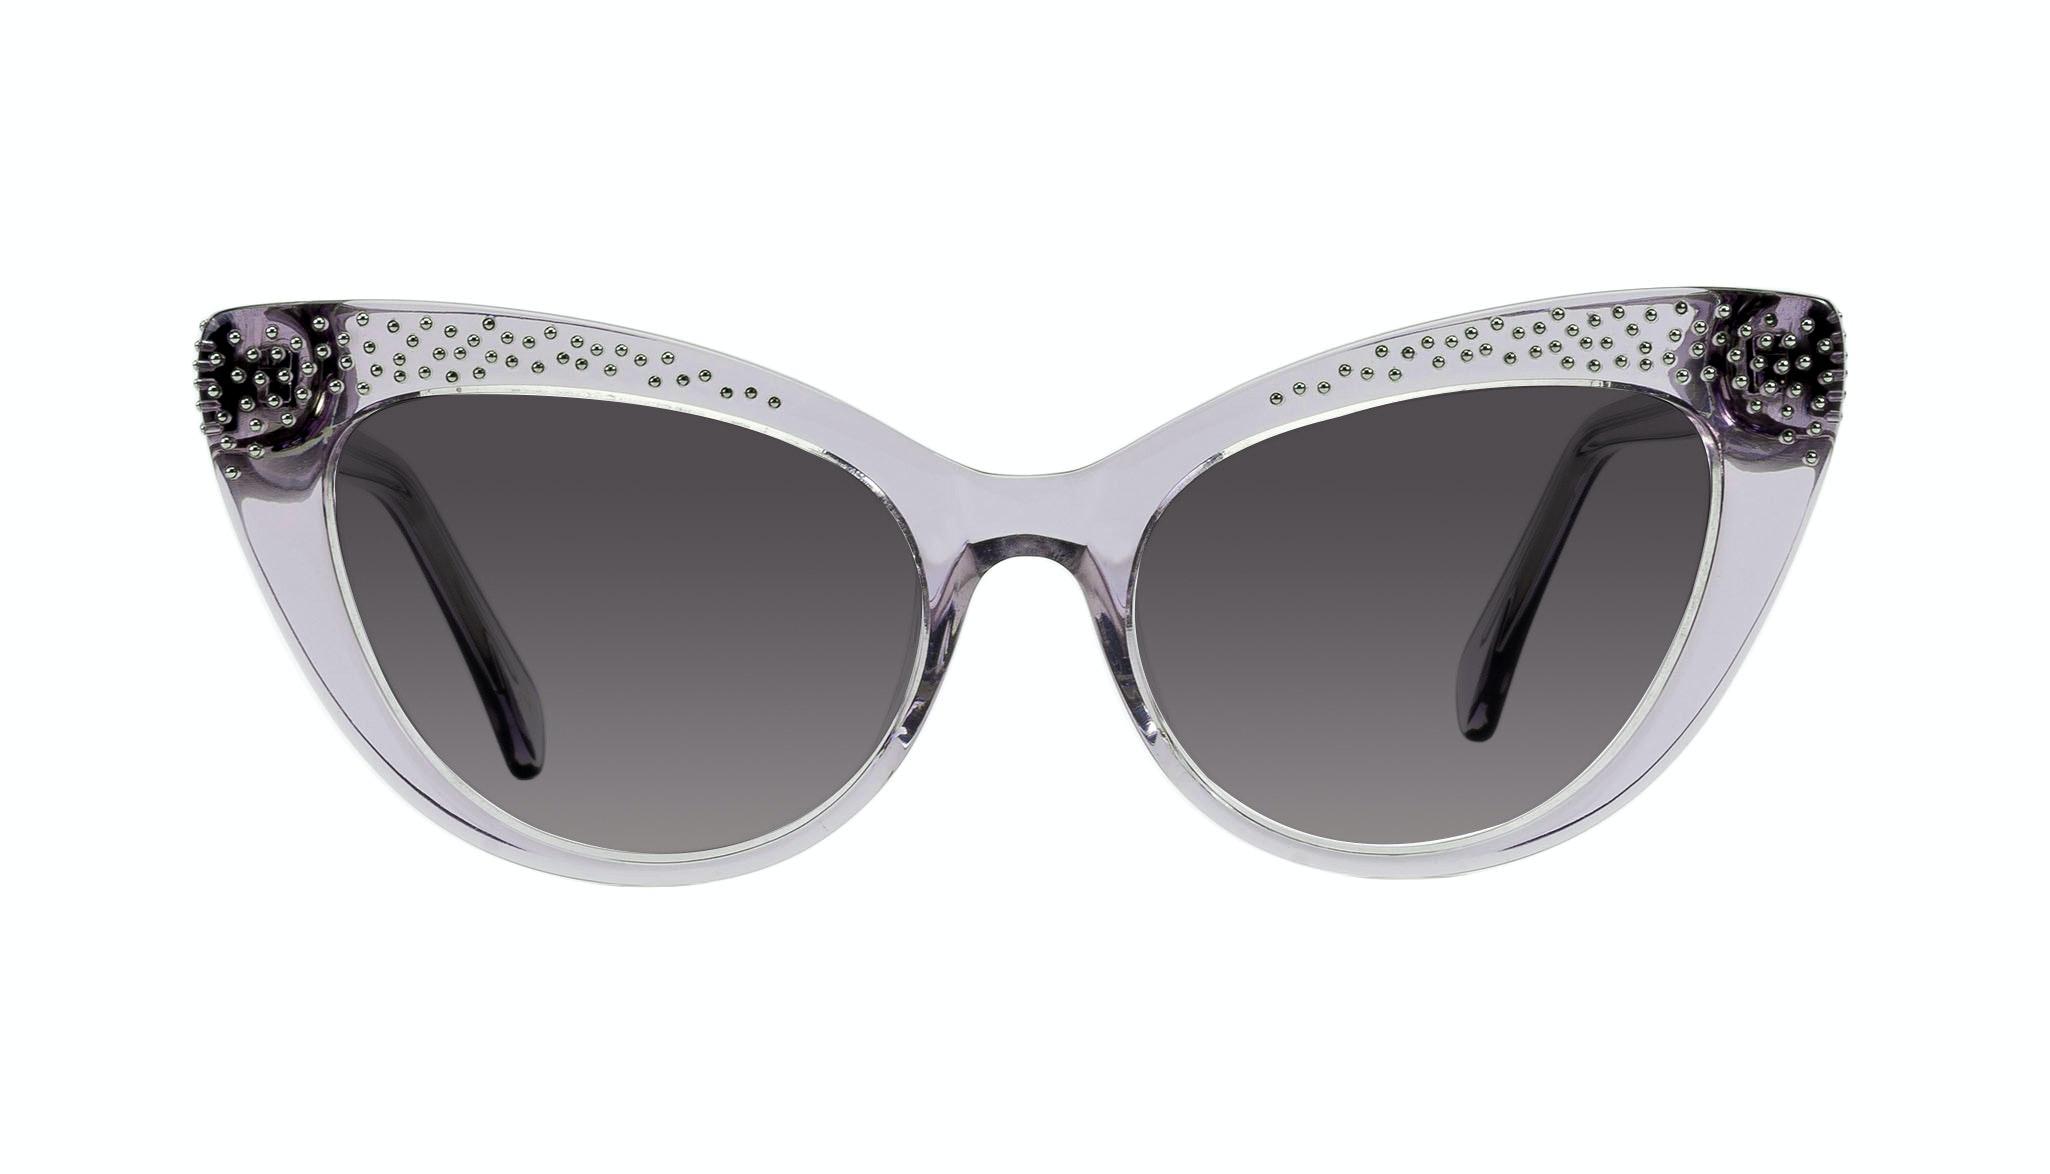 Affordable Fashion Glasses Cat Eye Sunglasses Women Keiko Moe May